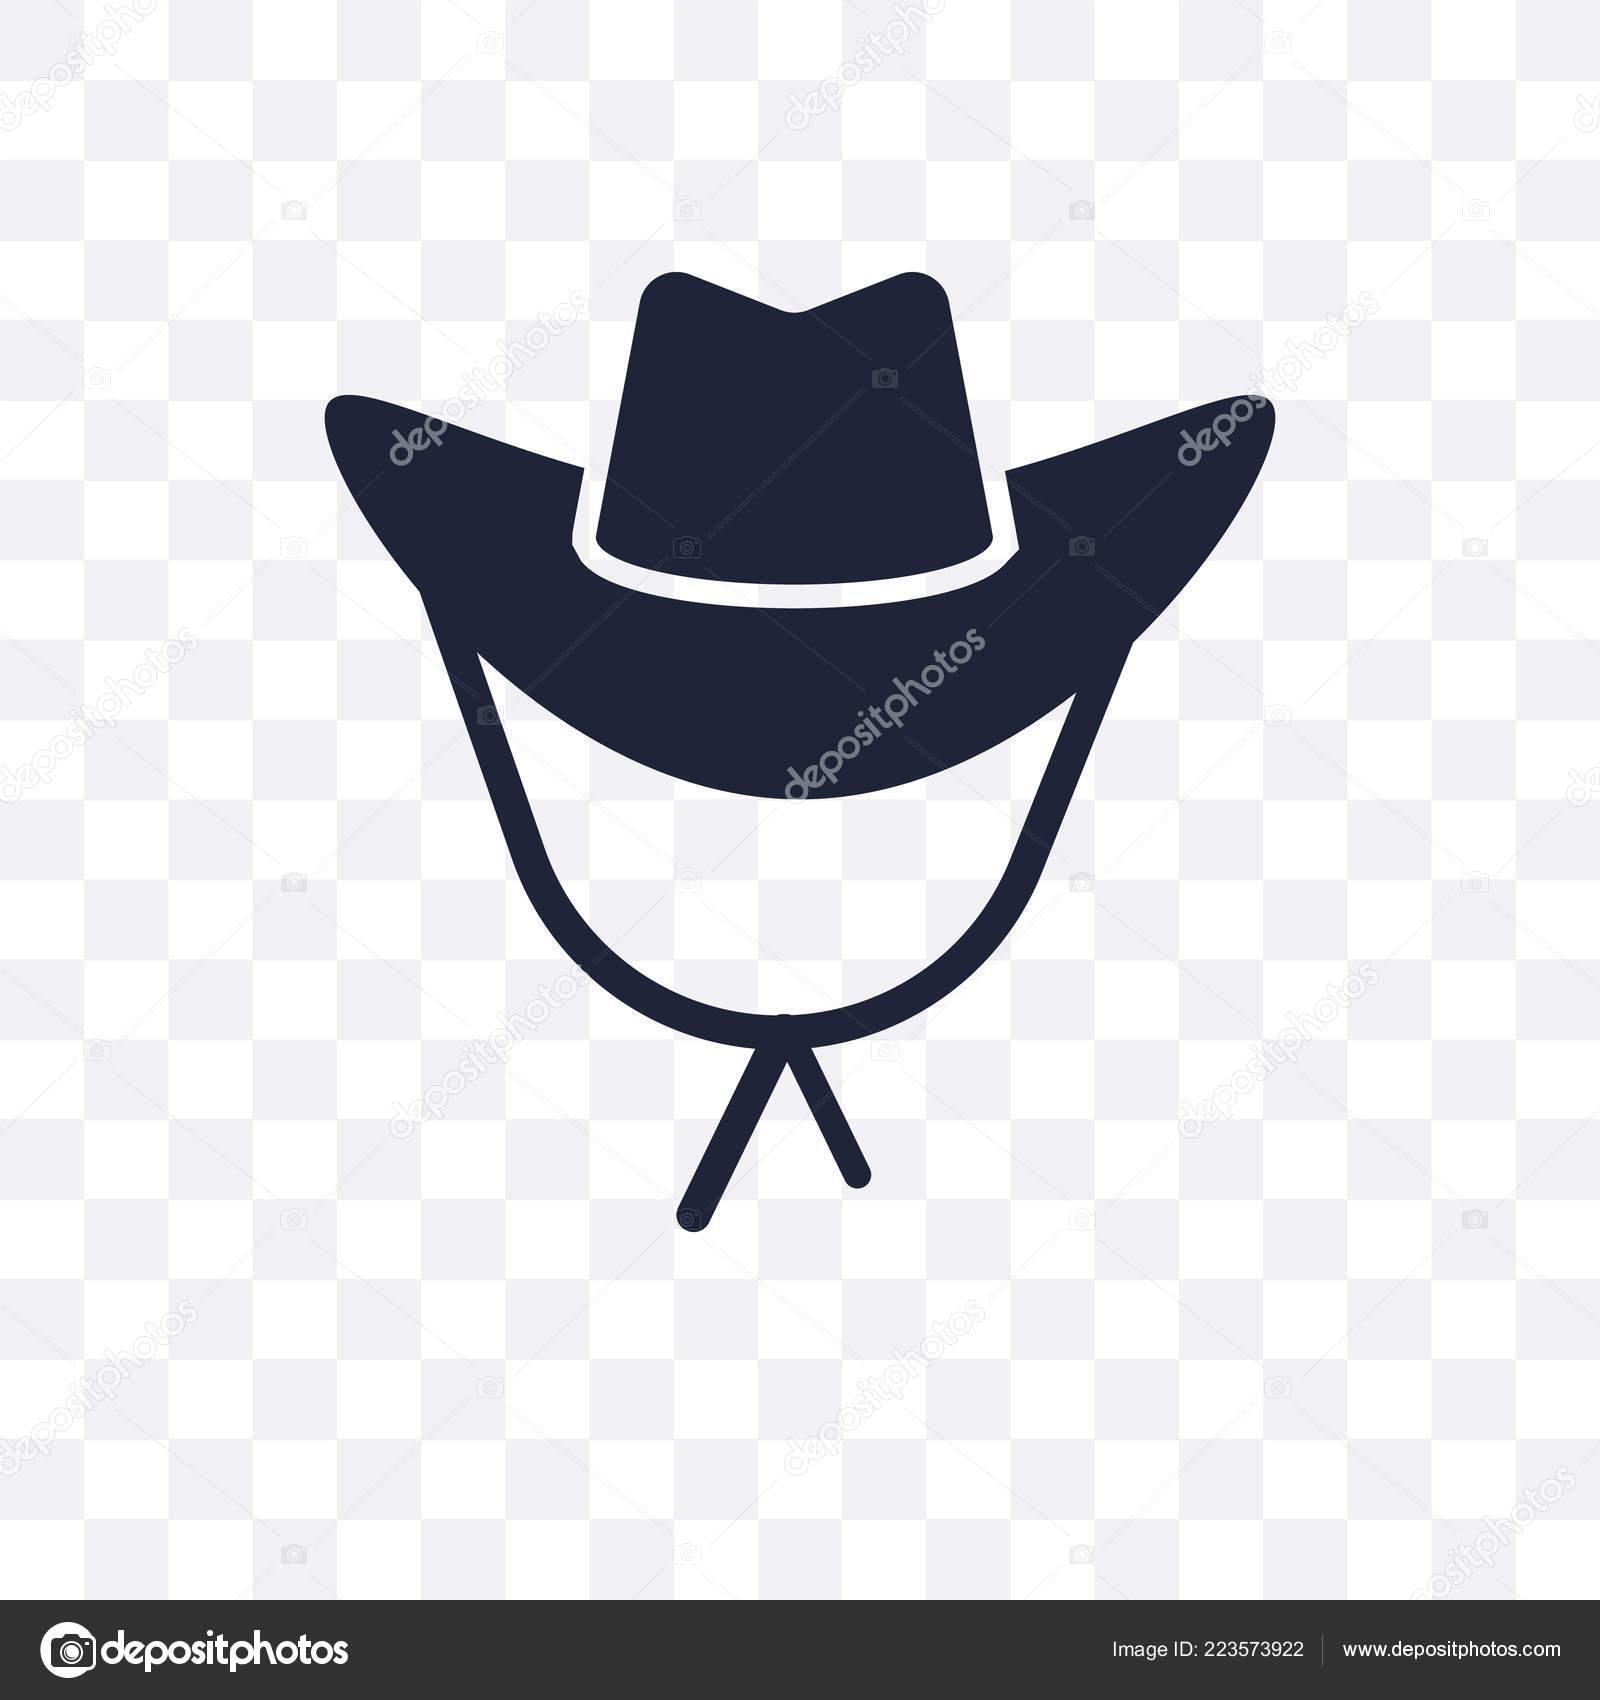 bf8fe9c5180a0 Cowboy Hat Transparent Icon Cowboy Hat Symbol Design Desert Collection–  stock illustration